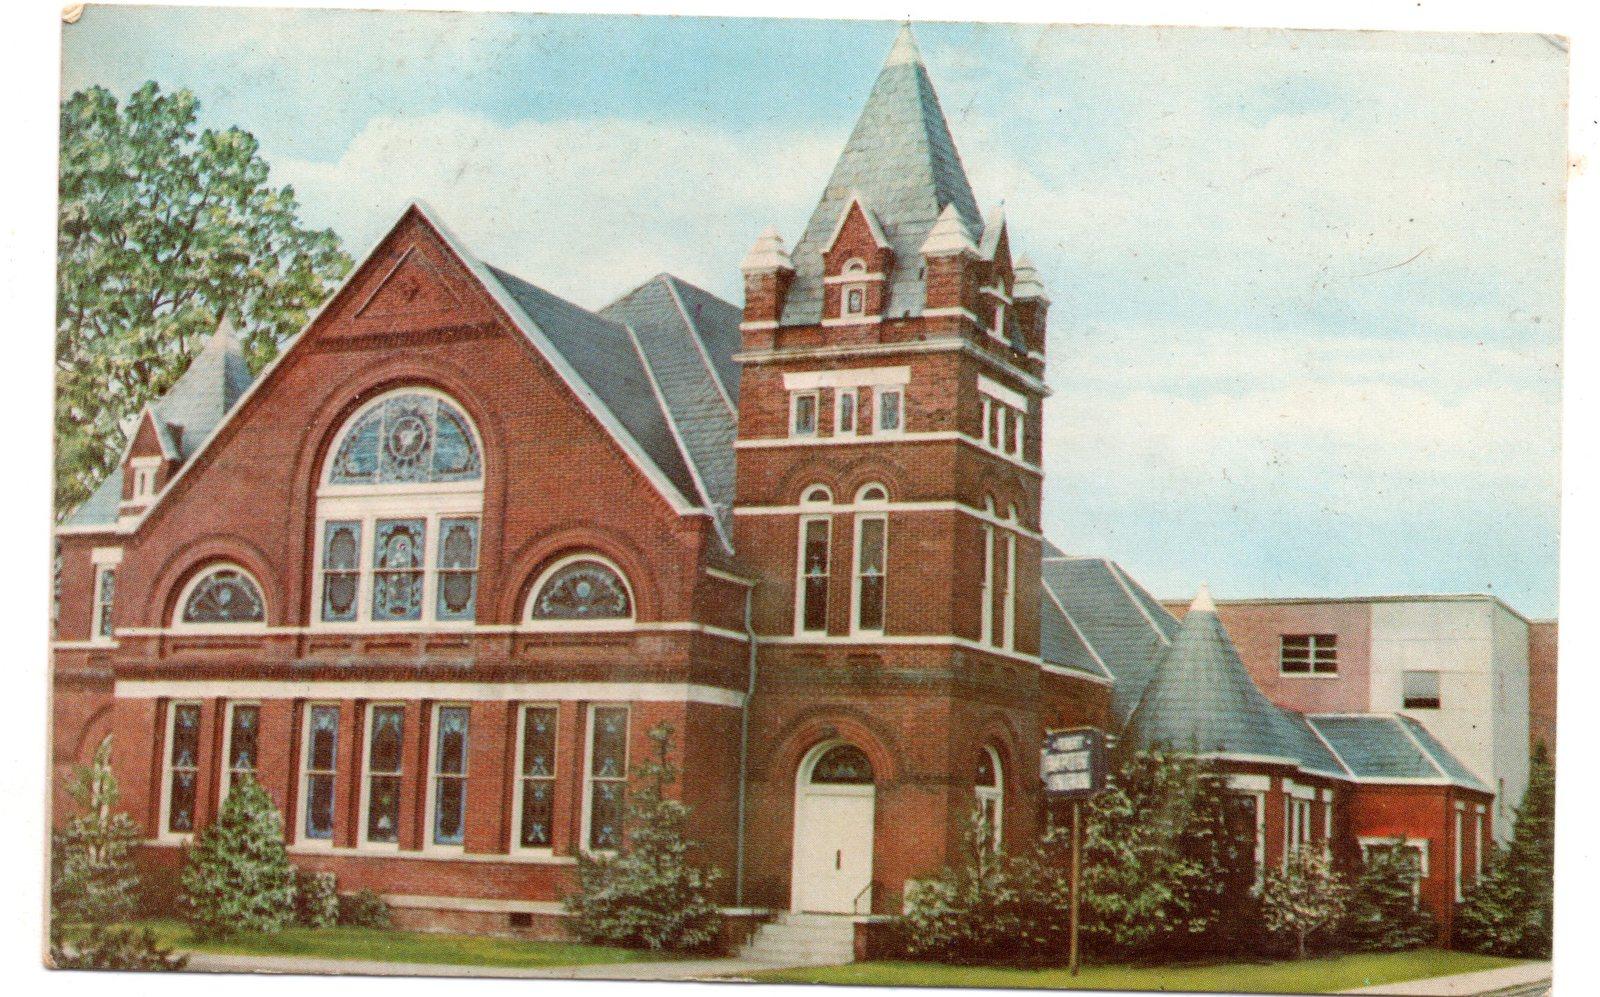 First Baptist Church Humboldt TN (1967) - Vintage Postcard - $4.00